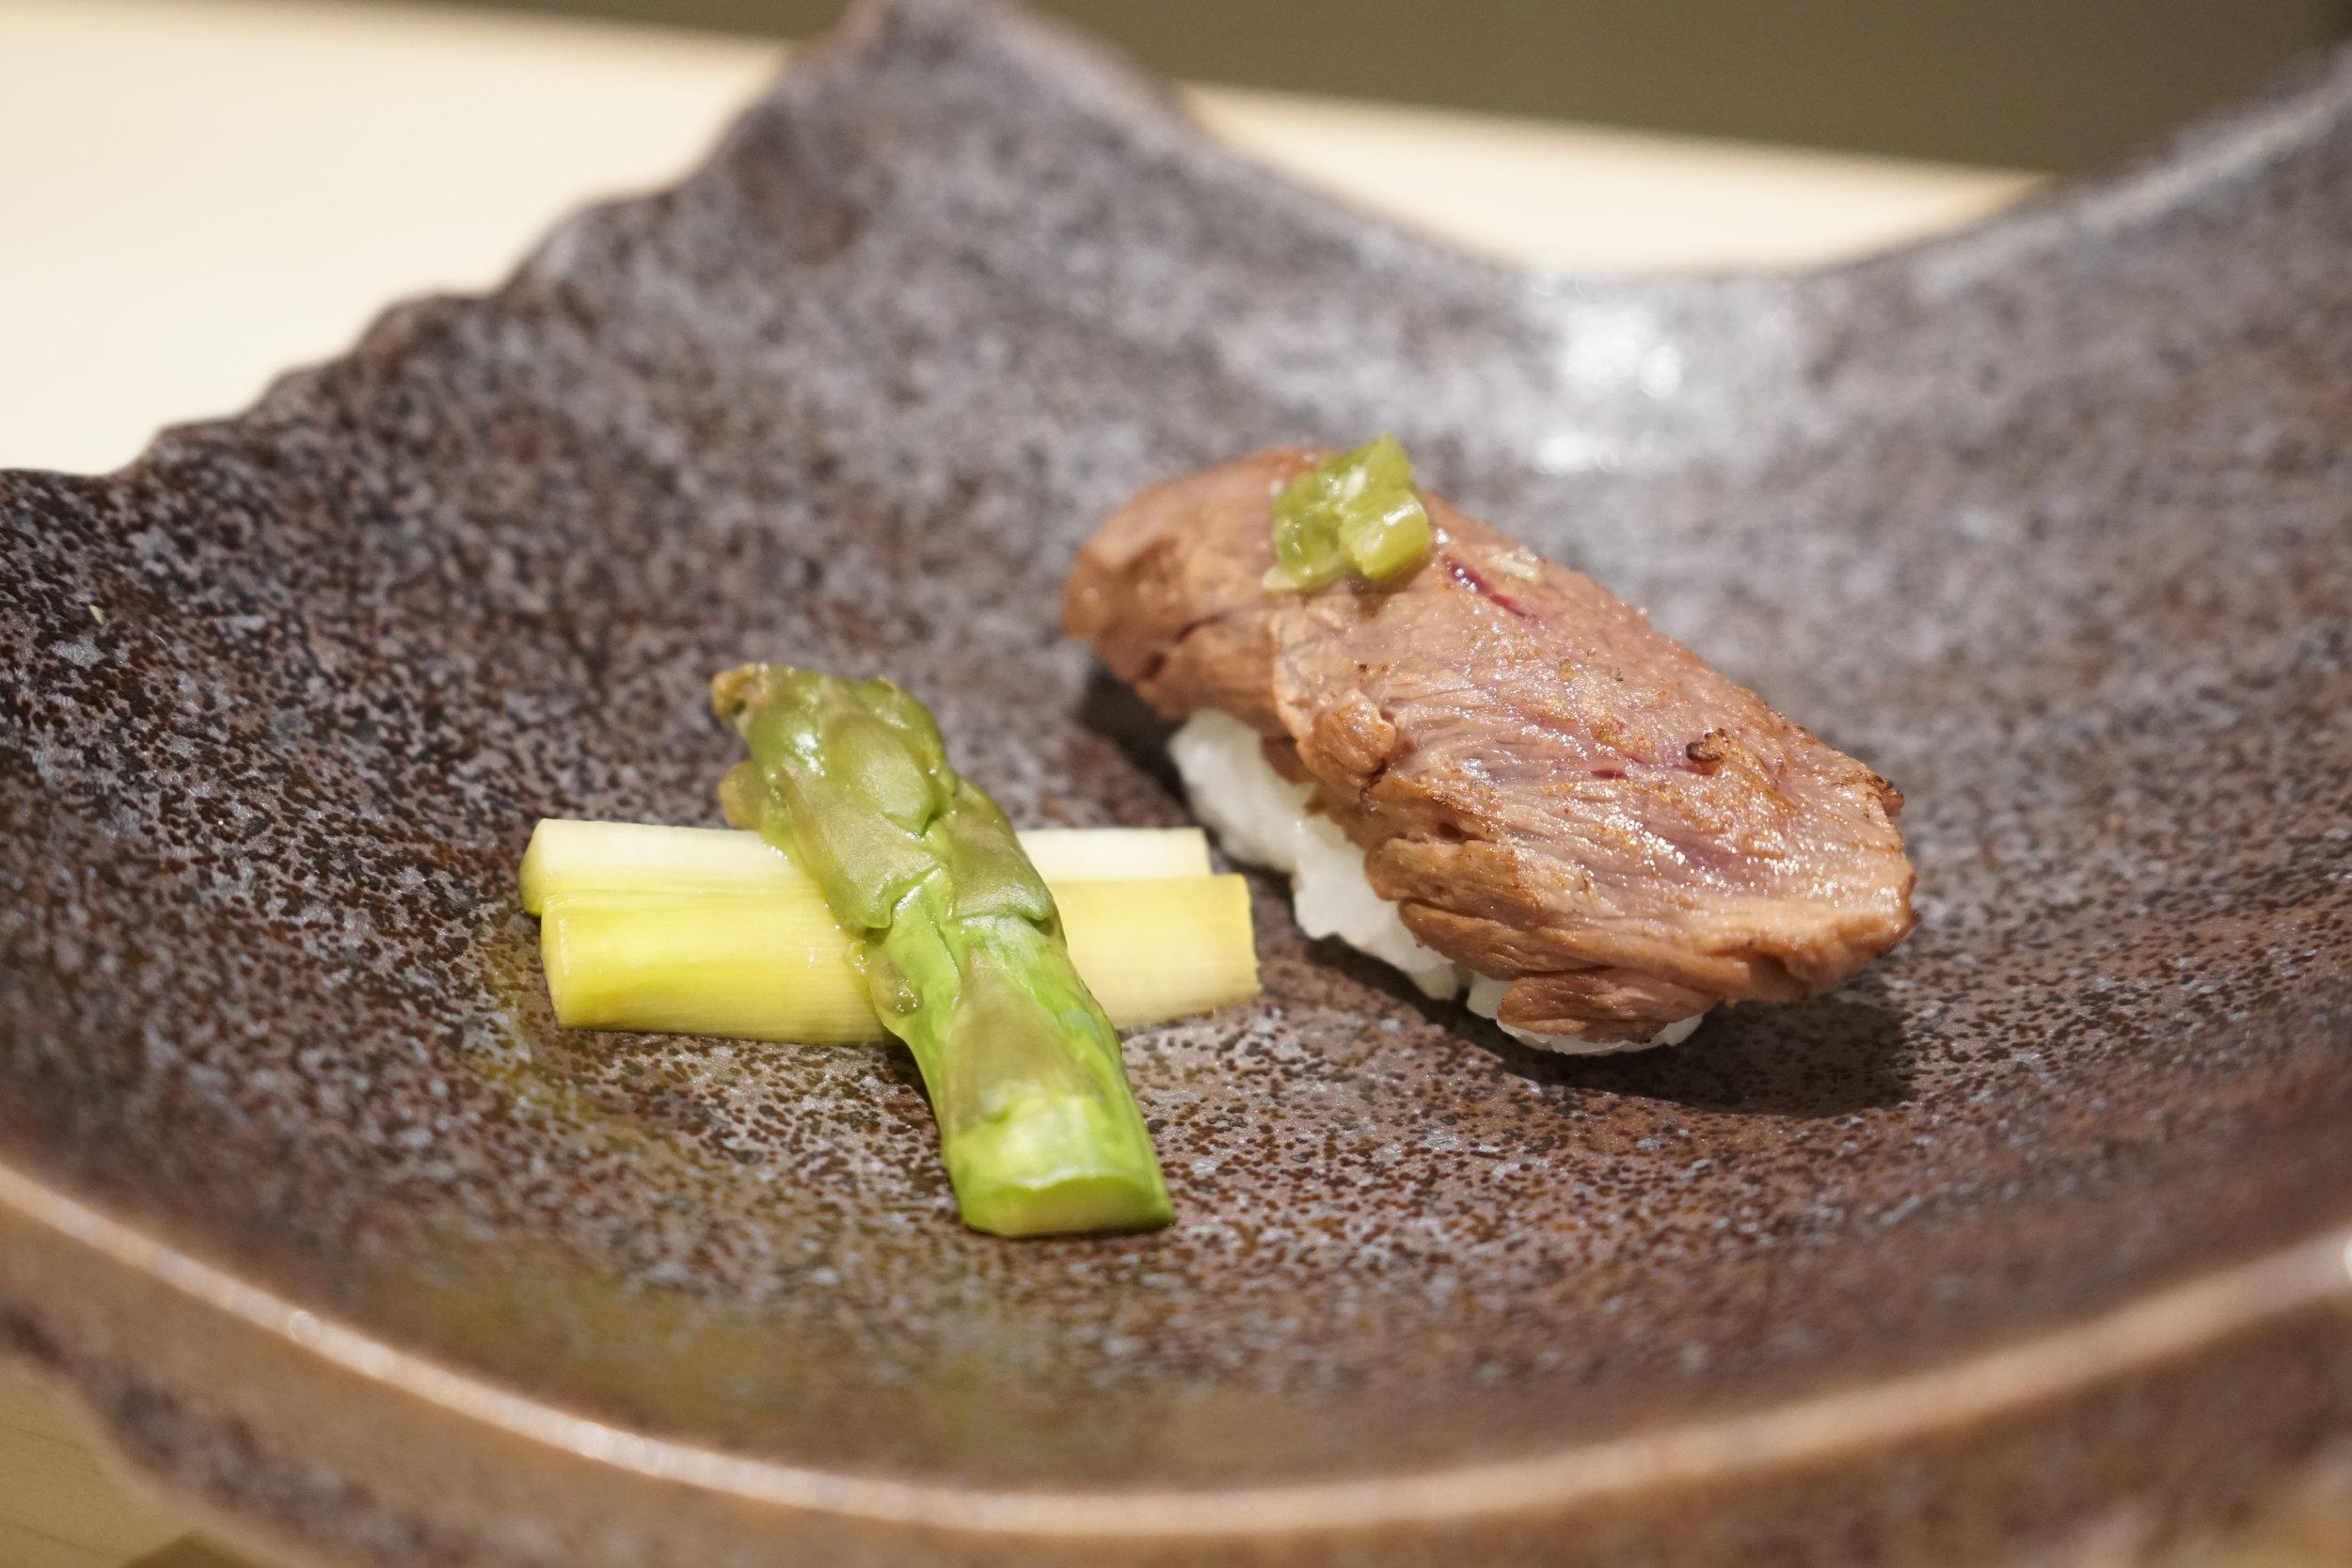 Washu Beef (Culotte) with Cipollini Onion at Shuraku in New York City